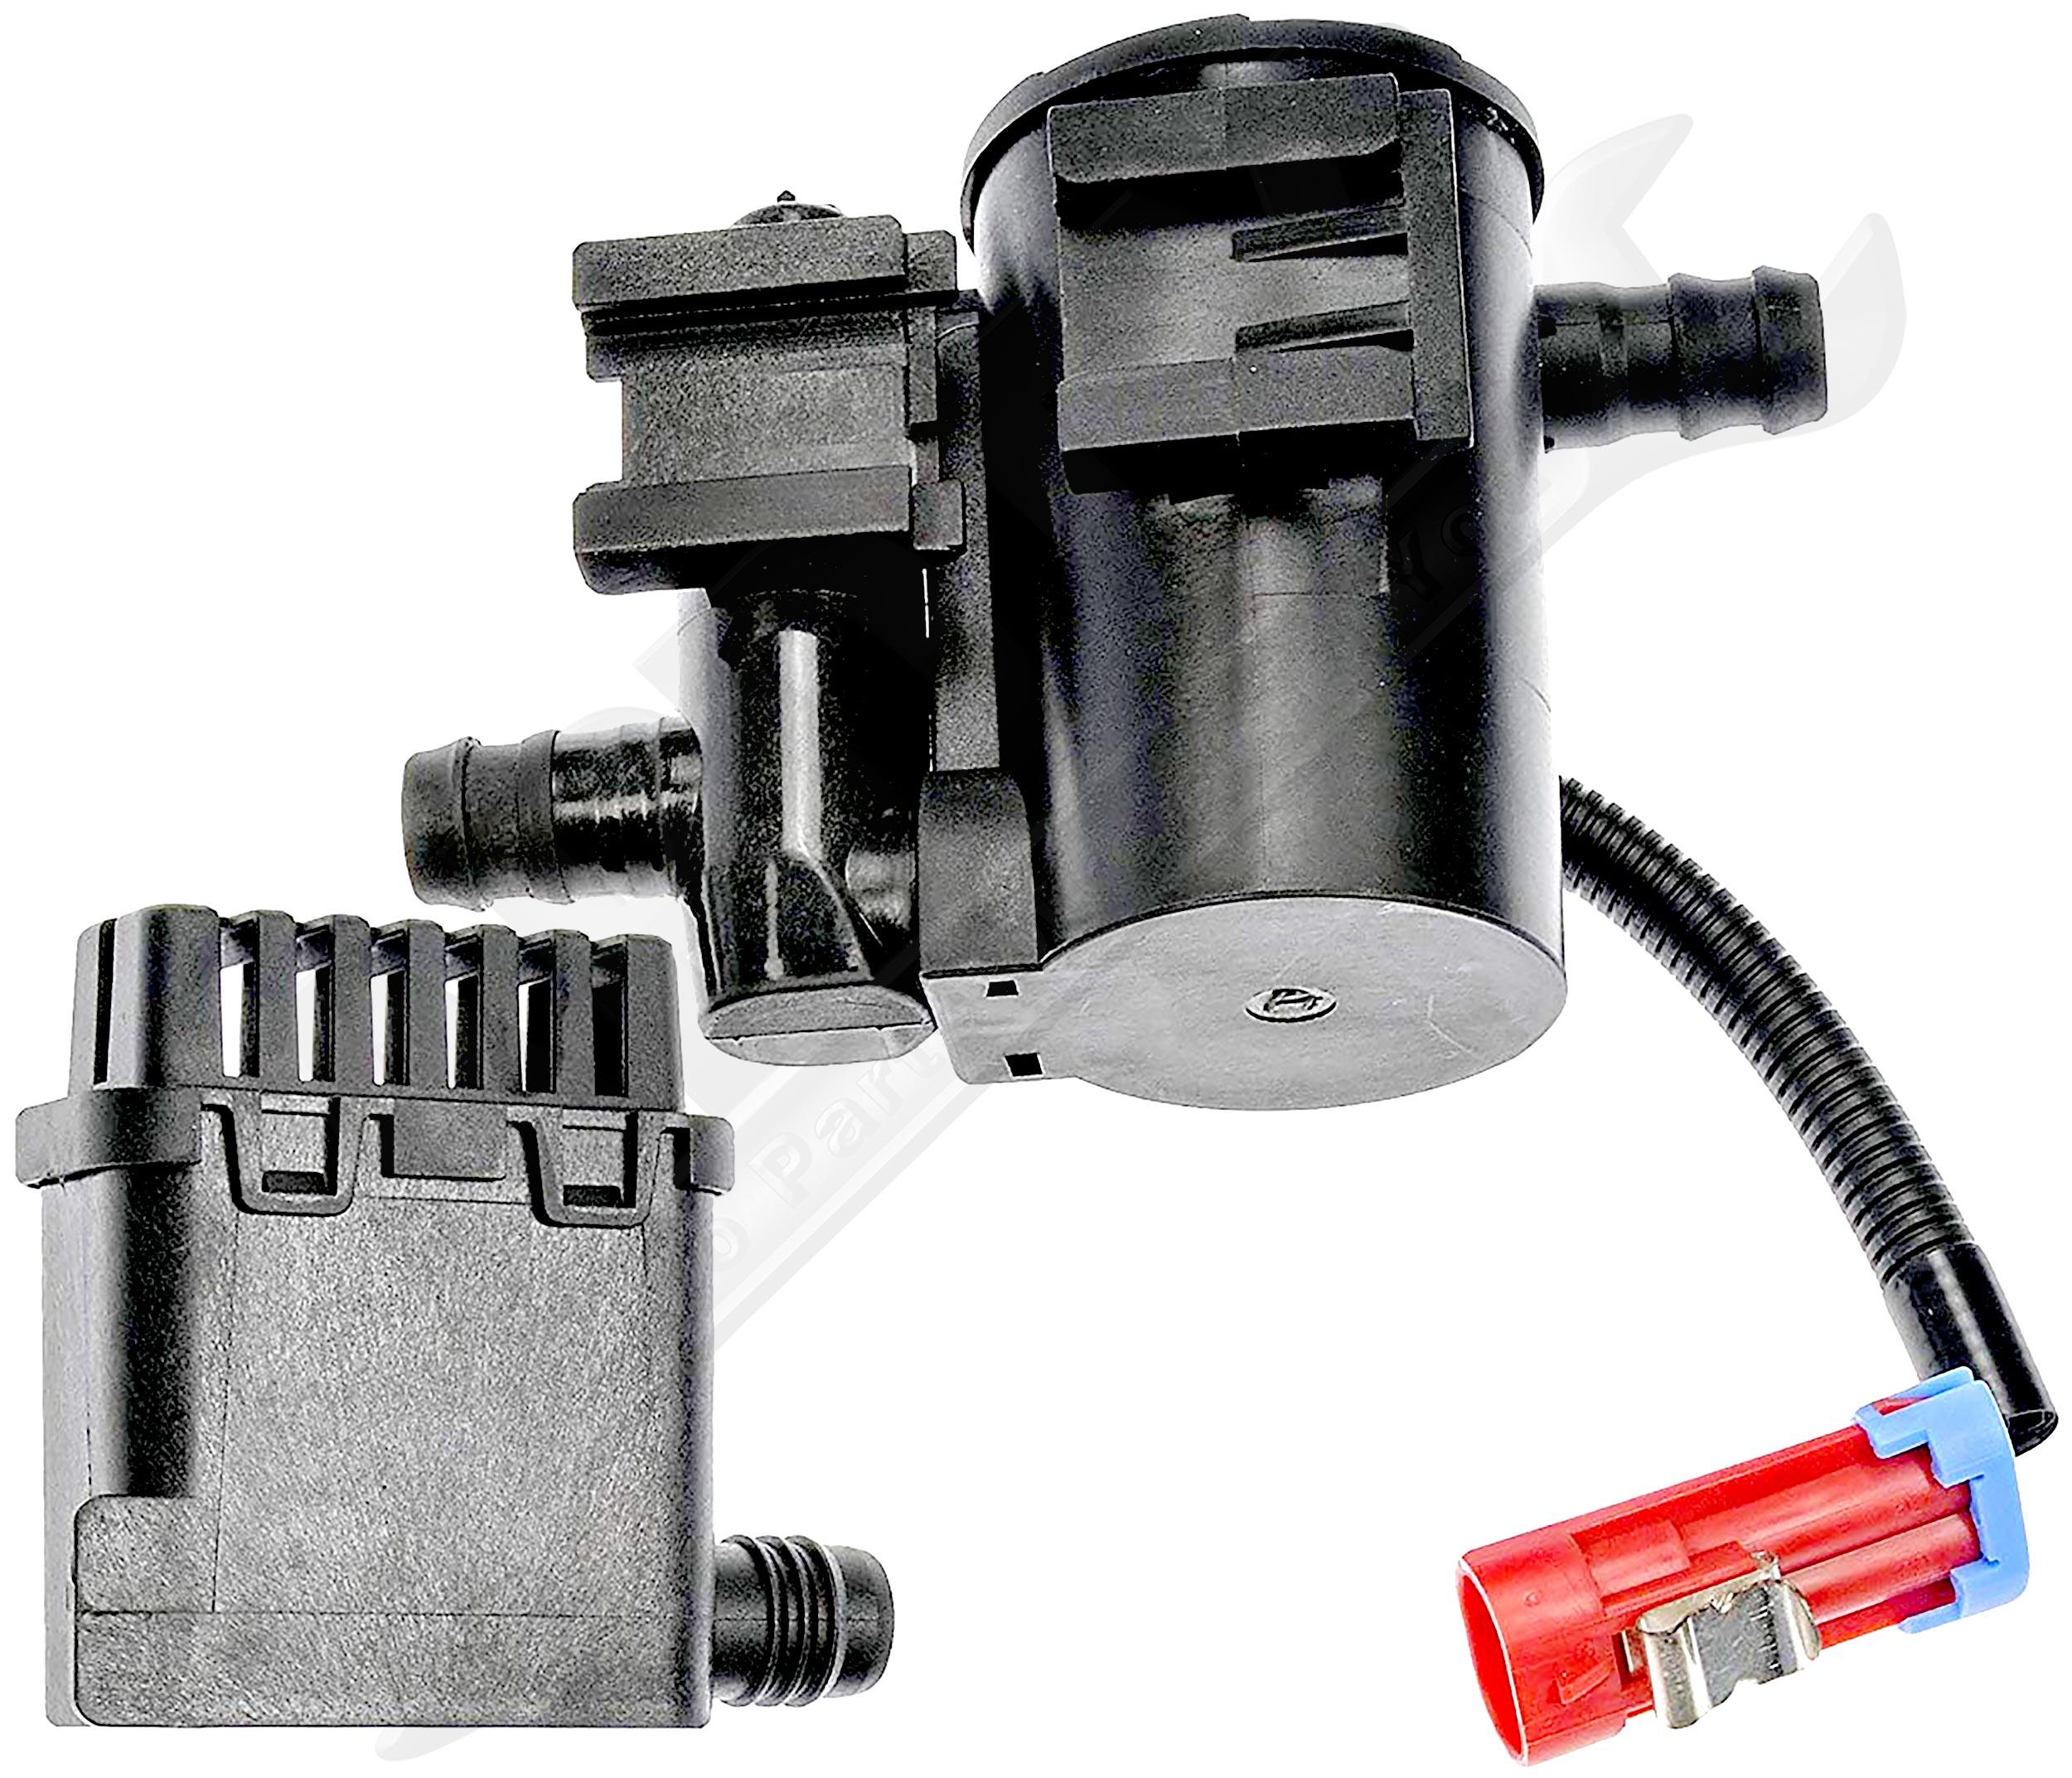 1997 chevy suburban wiring diagram chevy 4l60e